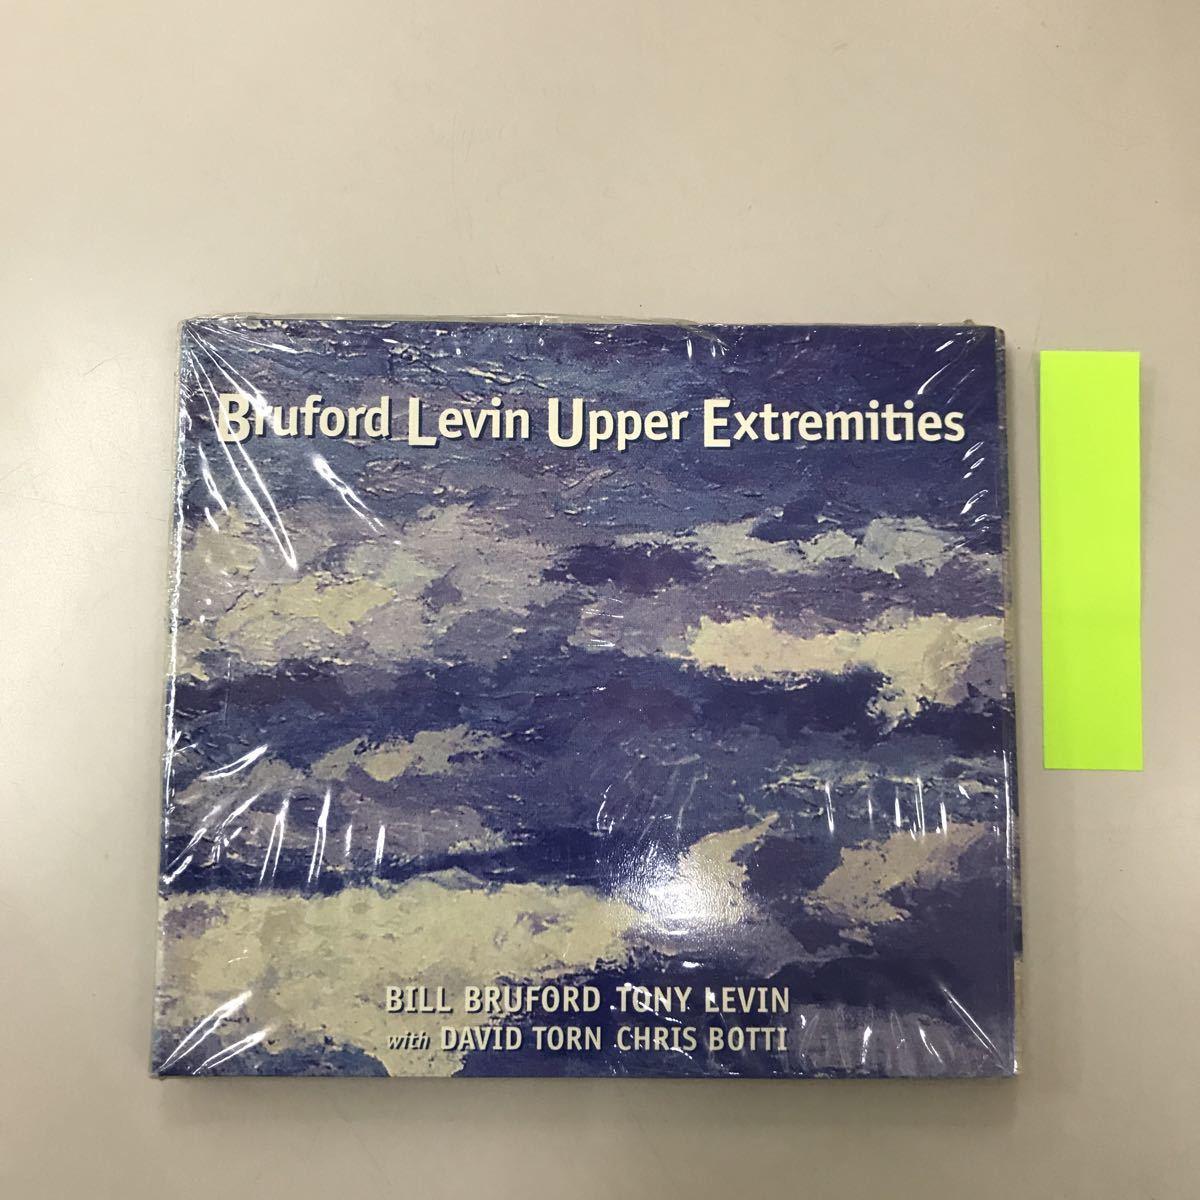 CD 輸入盤未開封【洋楽】長期保存品 Bruford Levin Upper Extremities